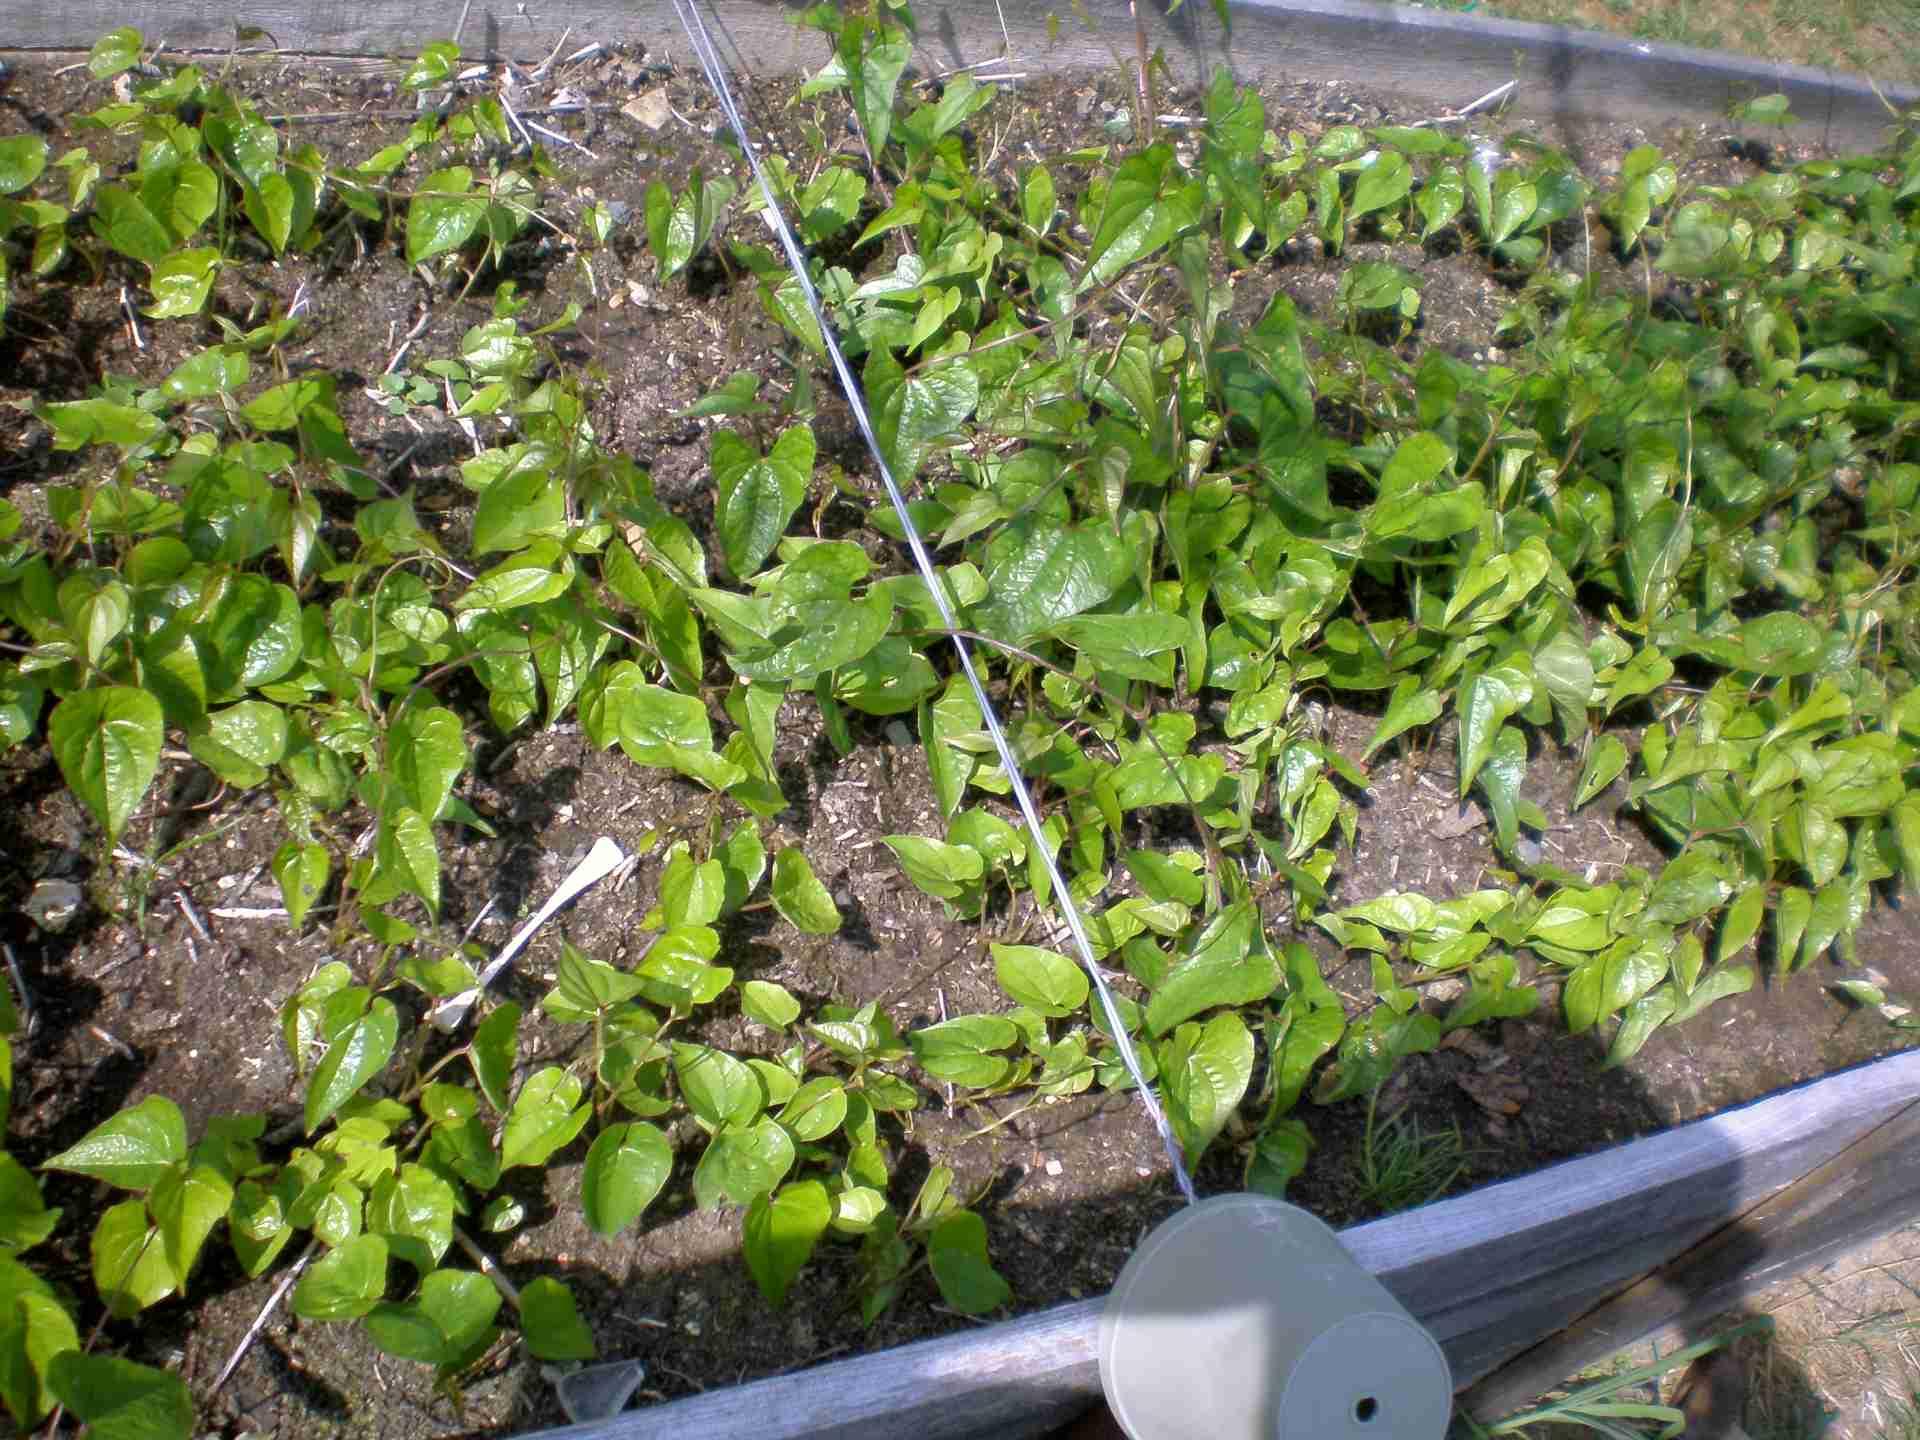 Ohrádka zaplněná mladými rostlinkami